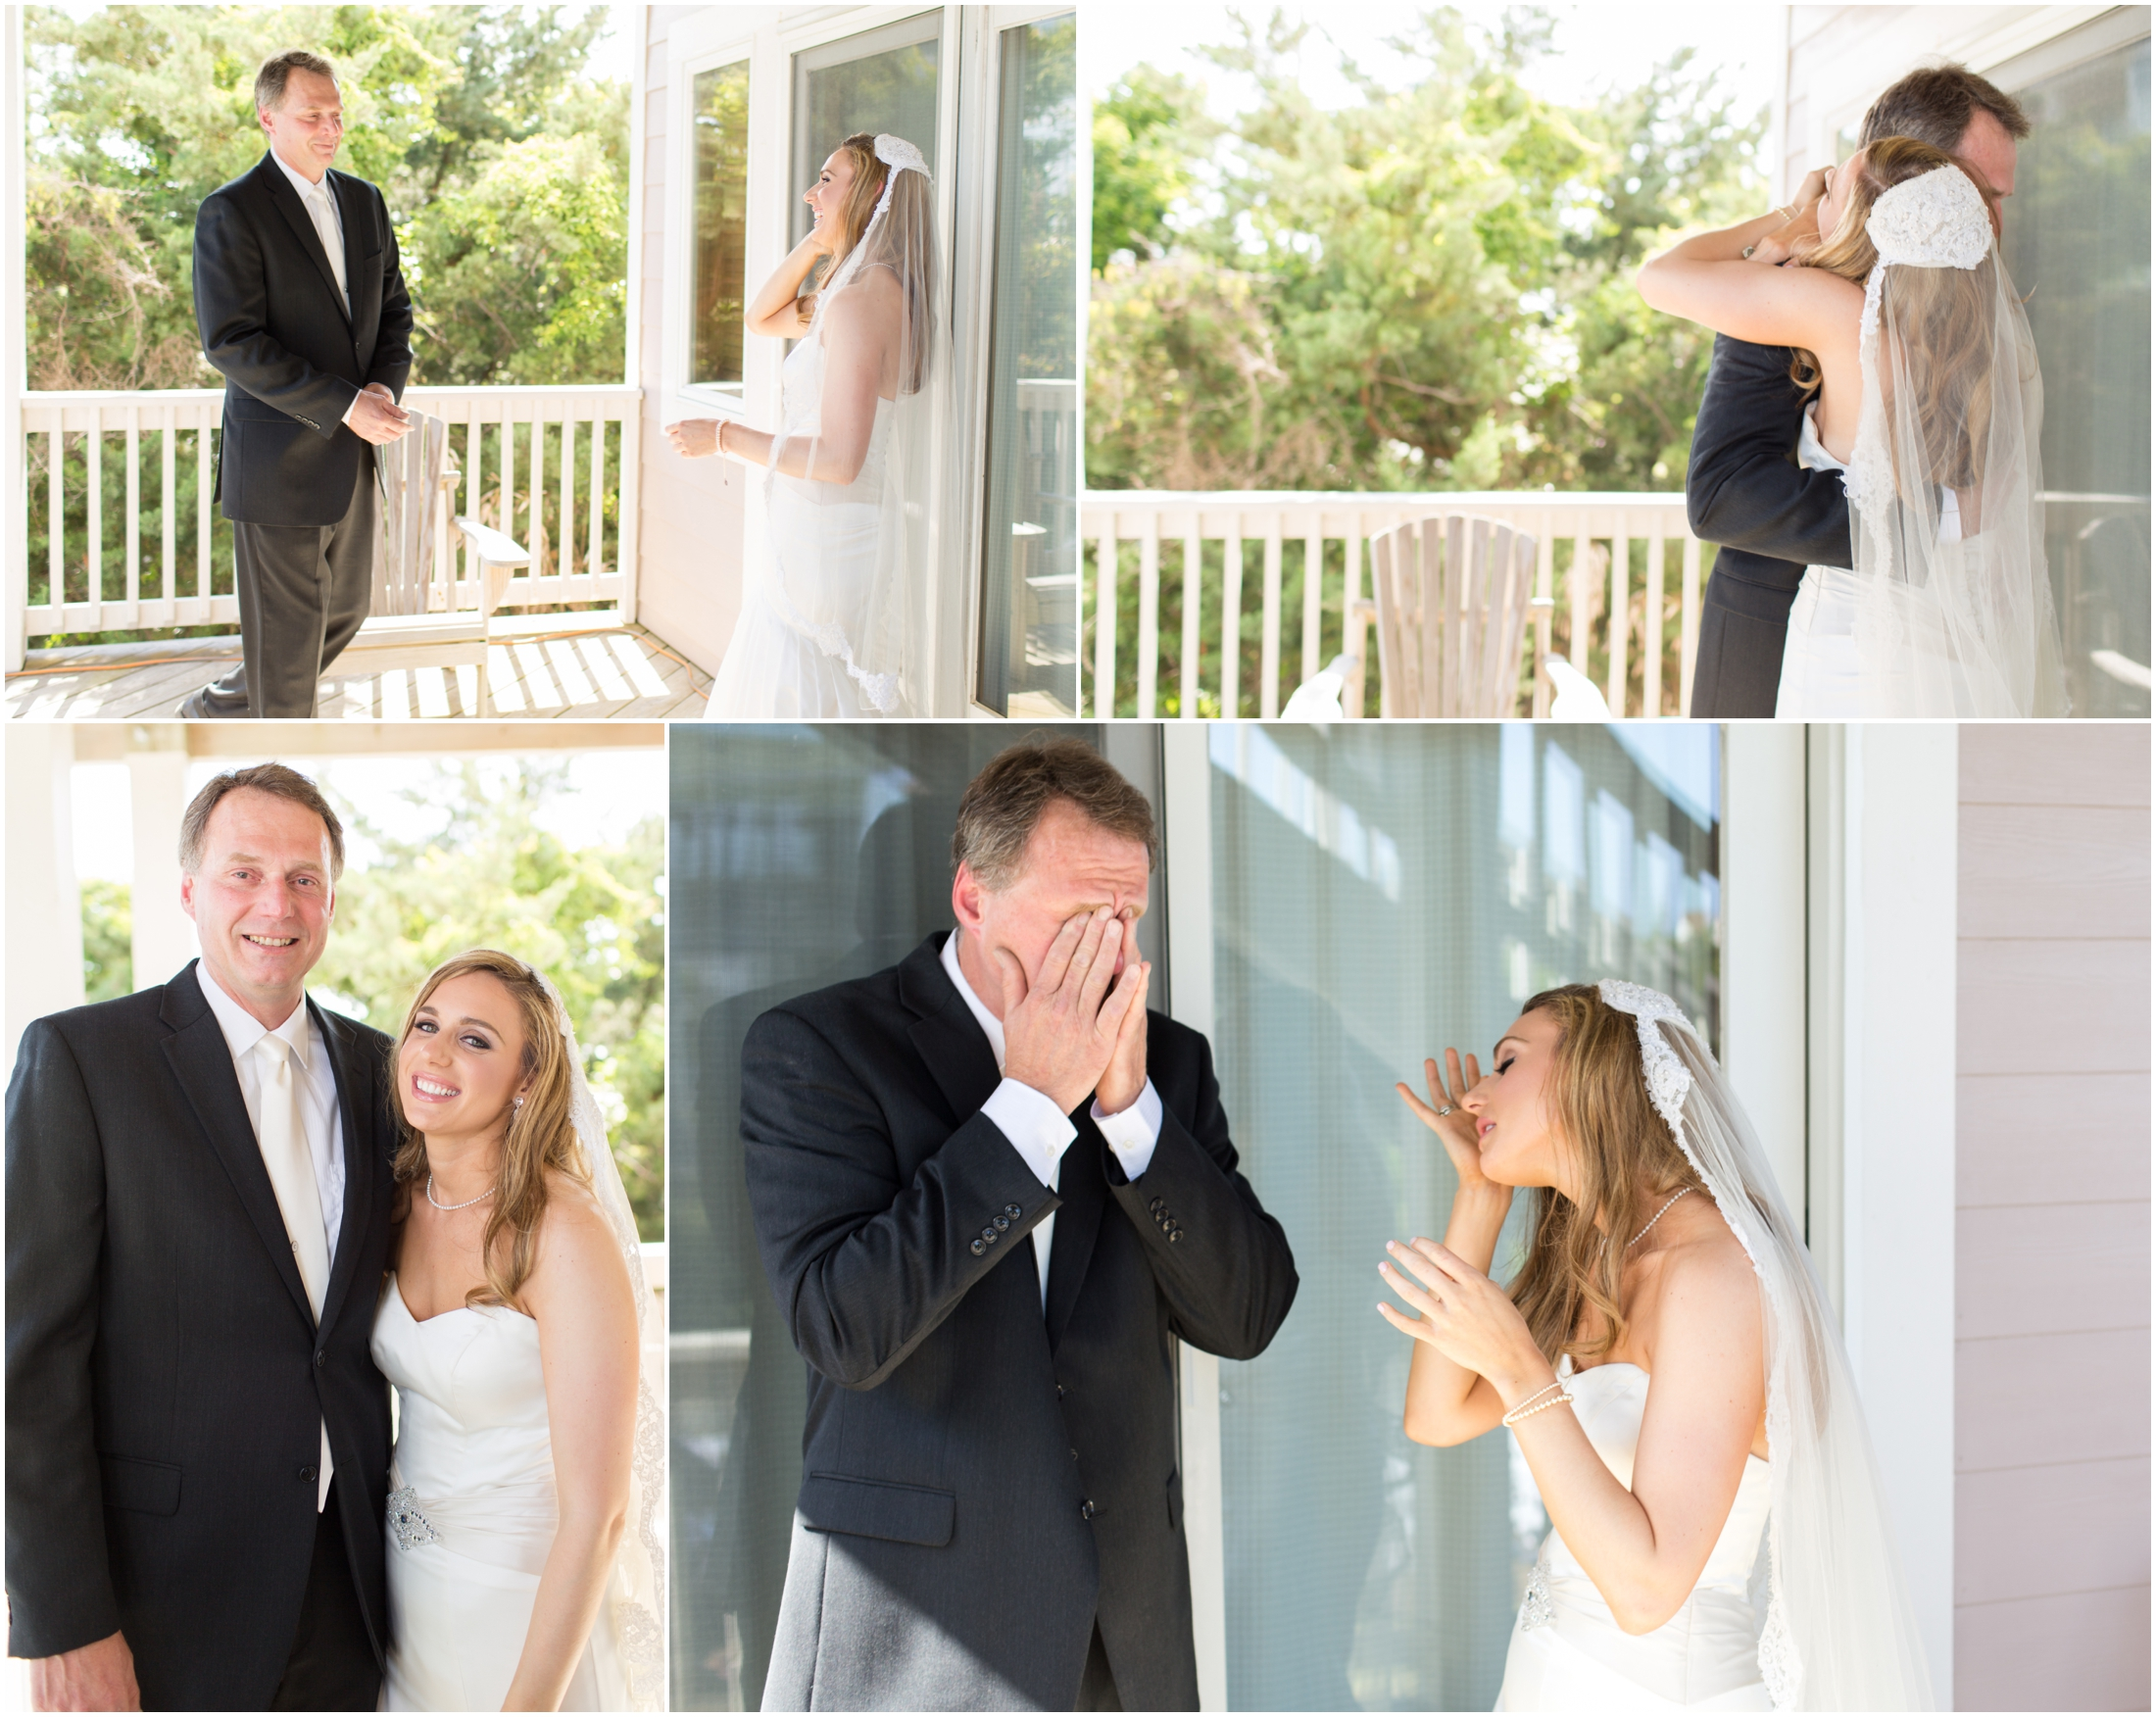 Pearce-Wedding-Family-Portraits-276.jpg